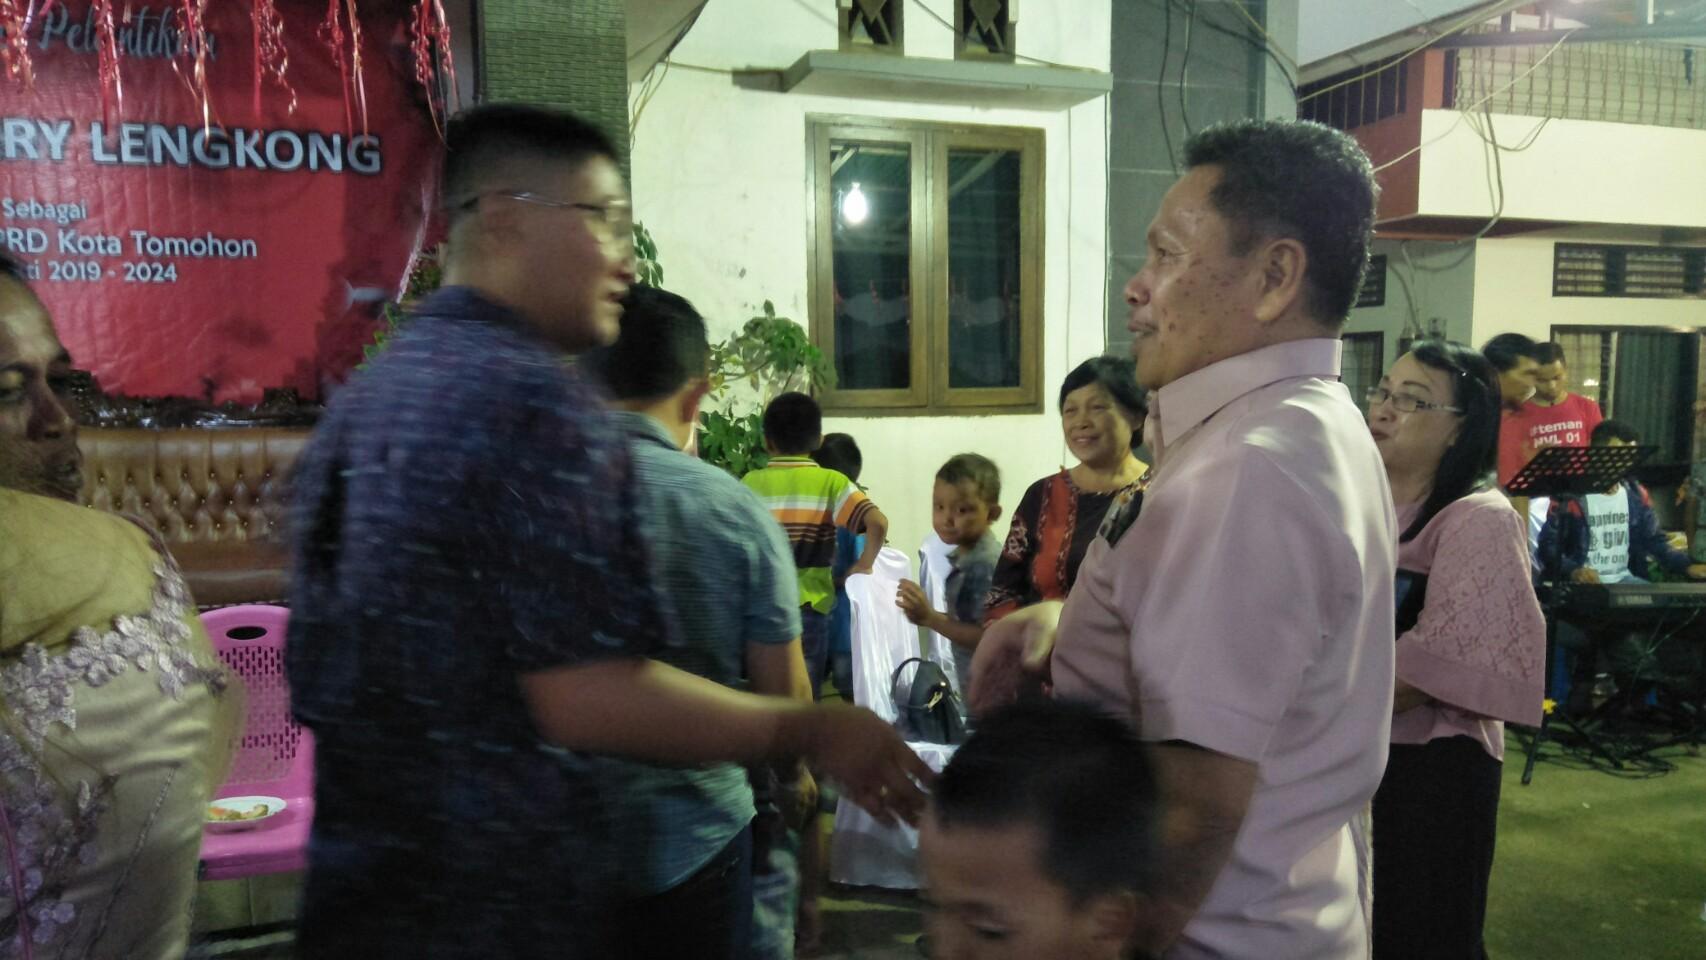 Dilantik Anggota DPRD Tomohon, Noldie Lengkong Gelar Ibadah Syukur